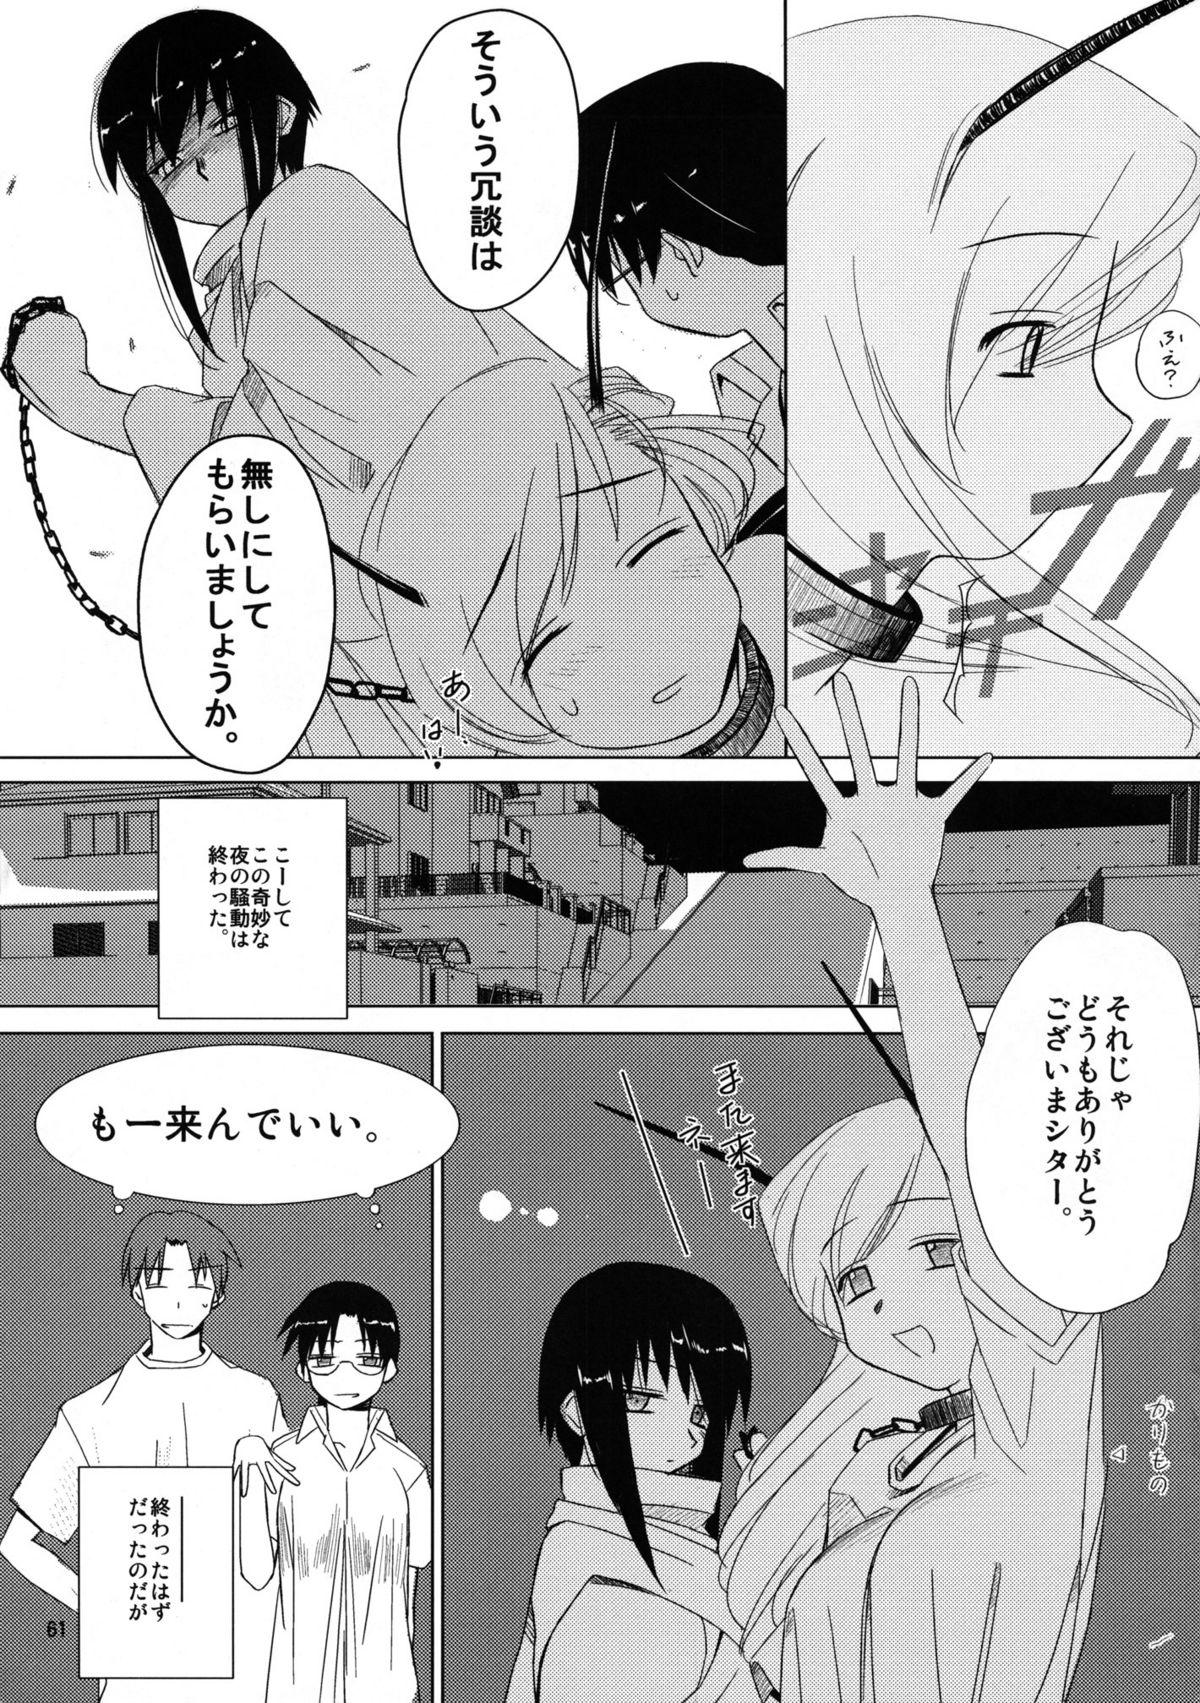 (C68) [Tear Drop (tsuina)] [C2] (To Heart) 61